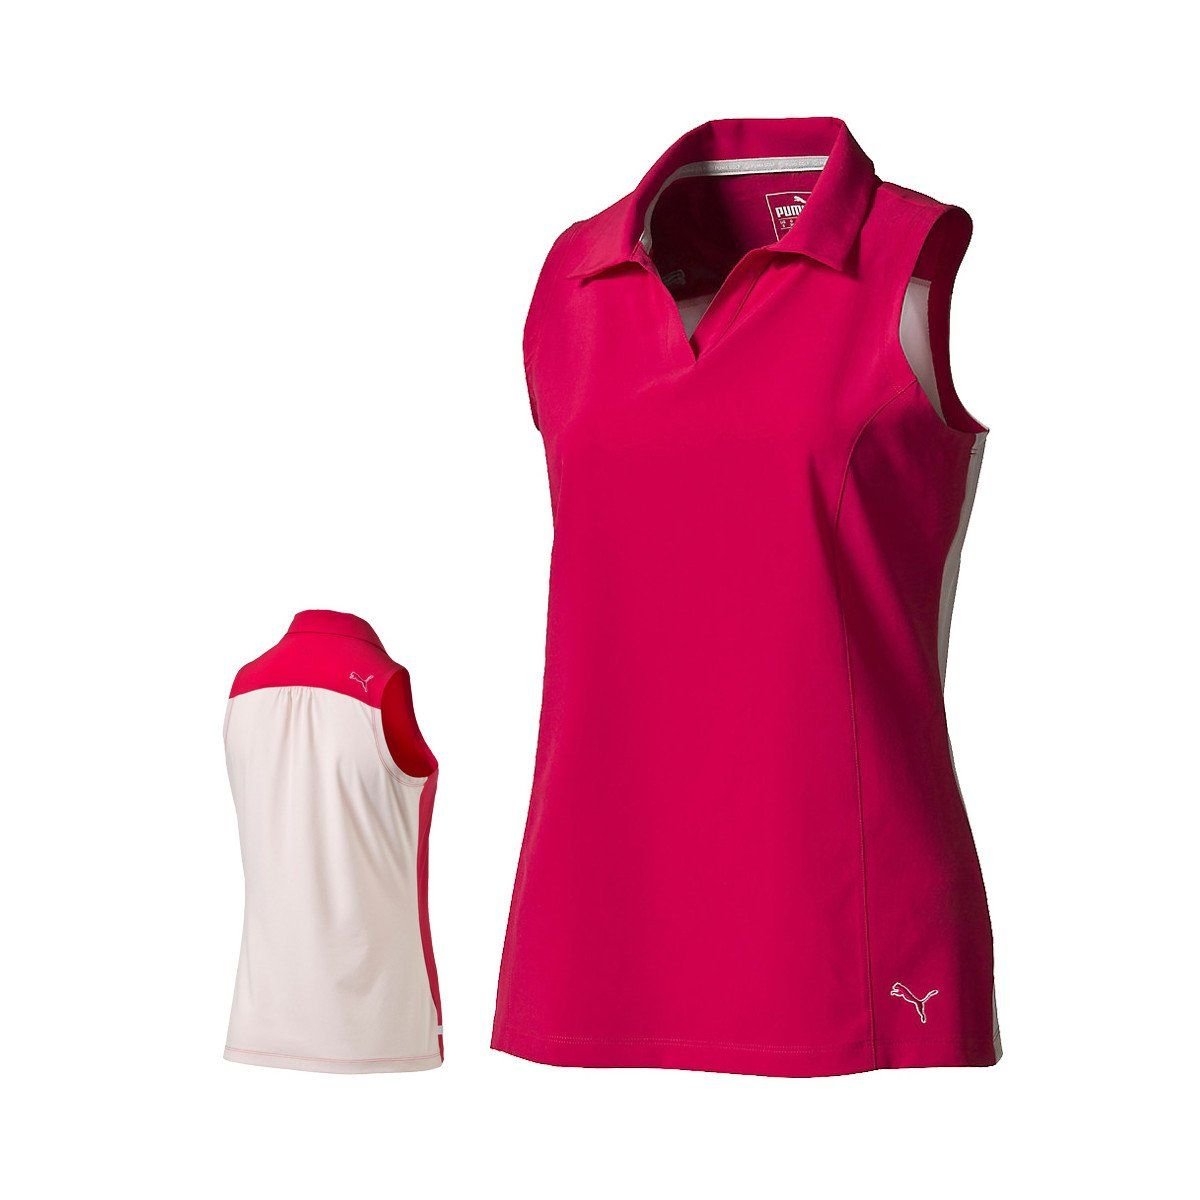 Puma Golf Women's Rose Red Woven Block Sleeveless Golf Polo